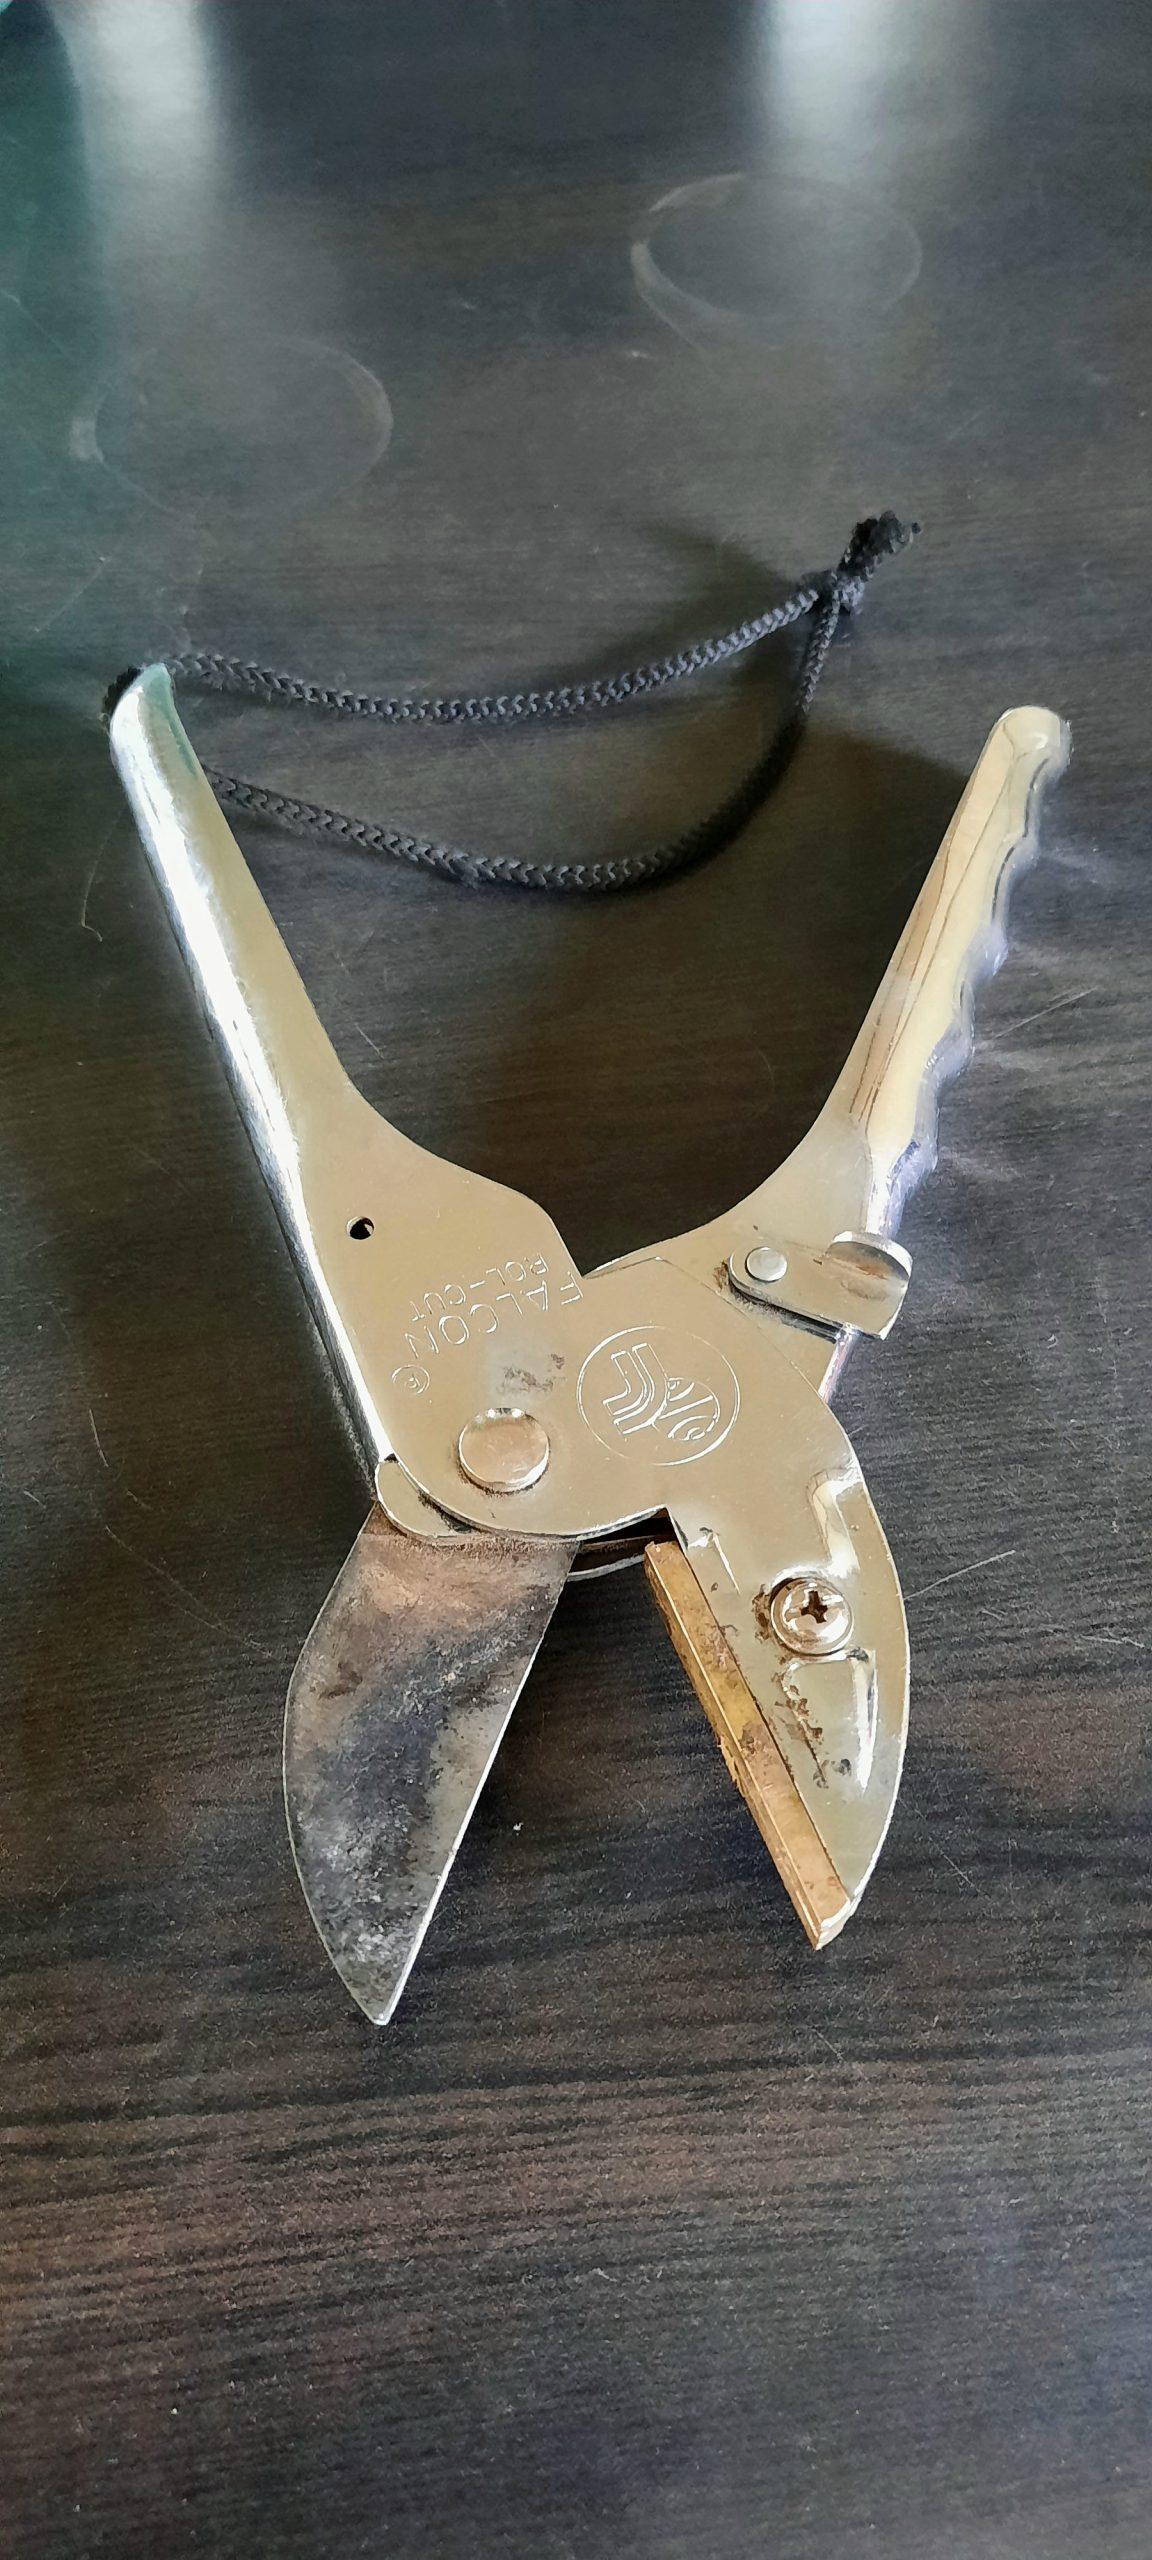 A plant cutter blade